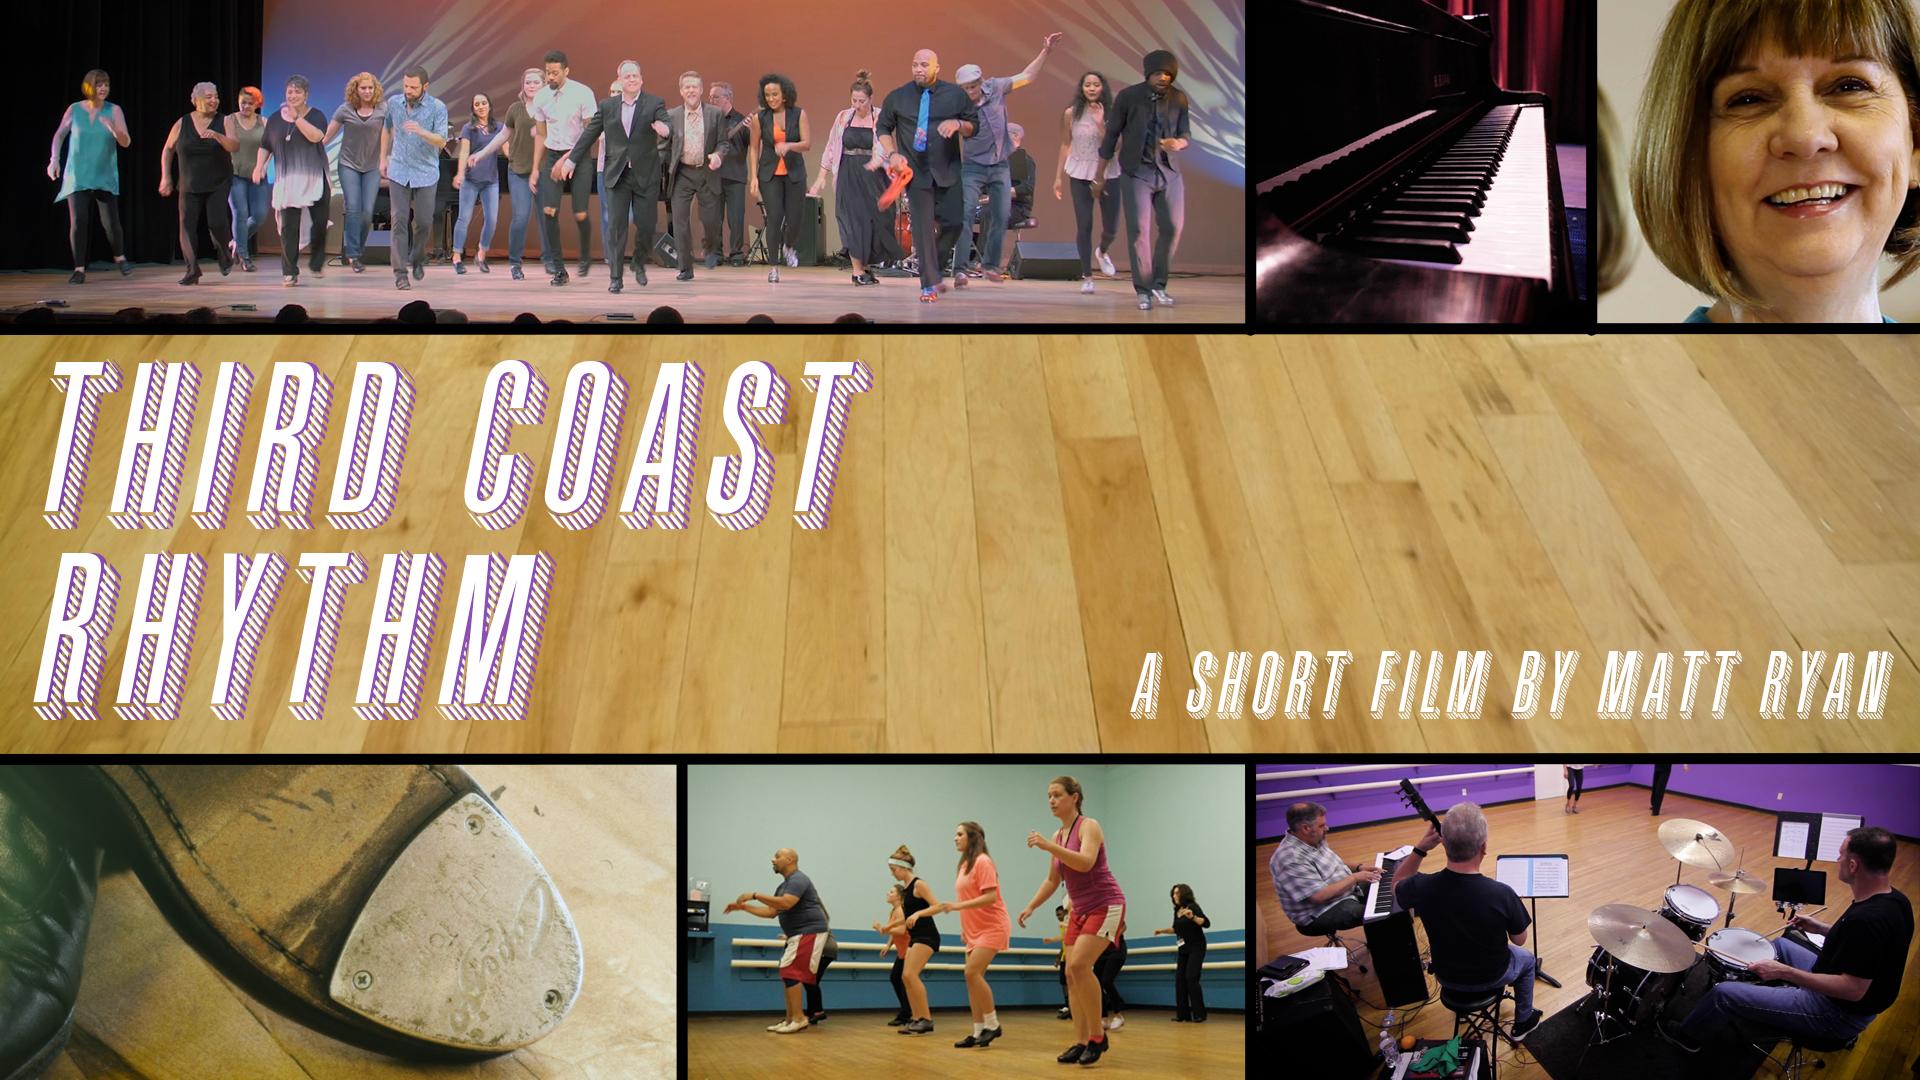 third-coast-rhythm-thumbnail